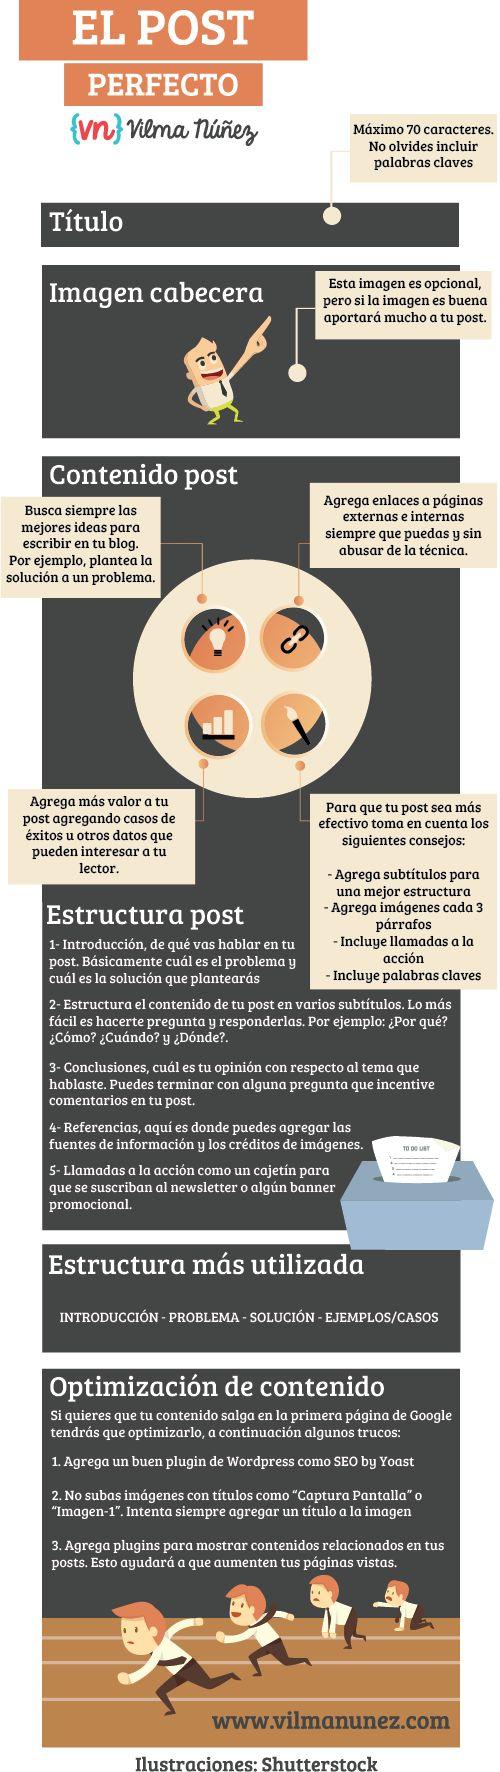 Cómo elabora el post para tu blog #infografia #infographic #socialmedia